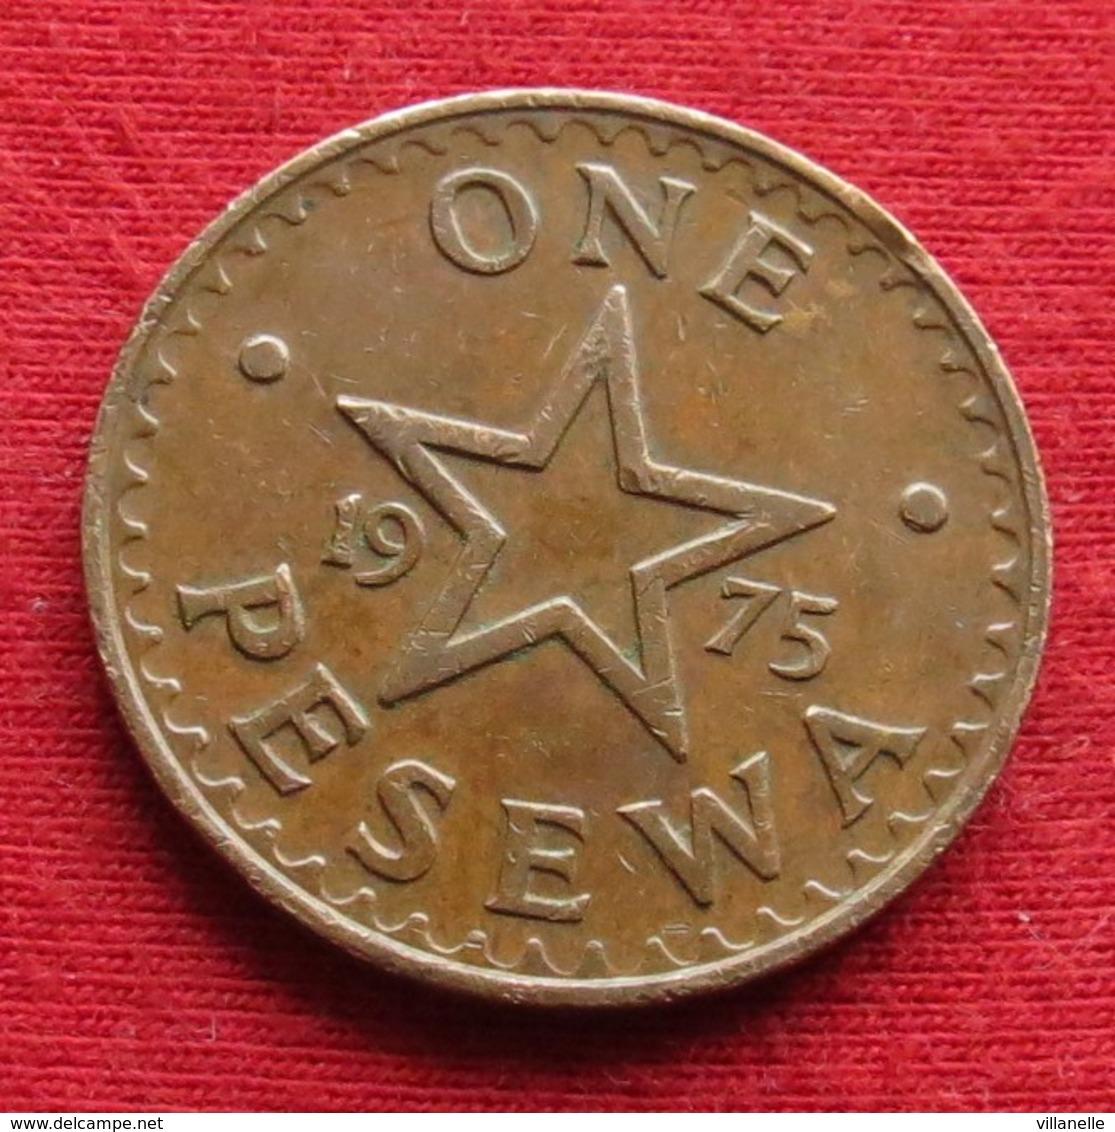 Ghana 1 One Pesewa 1975 KM# 13 Gana - Ghana